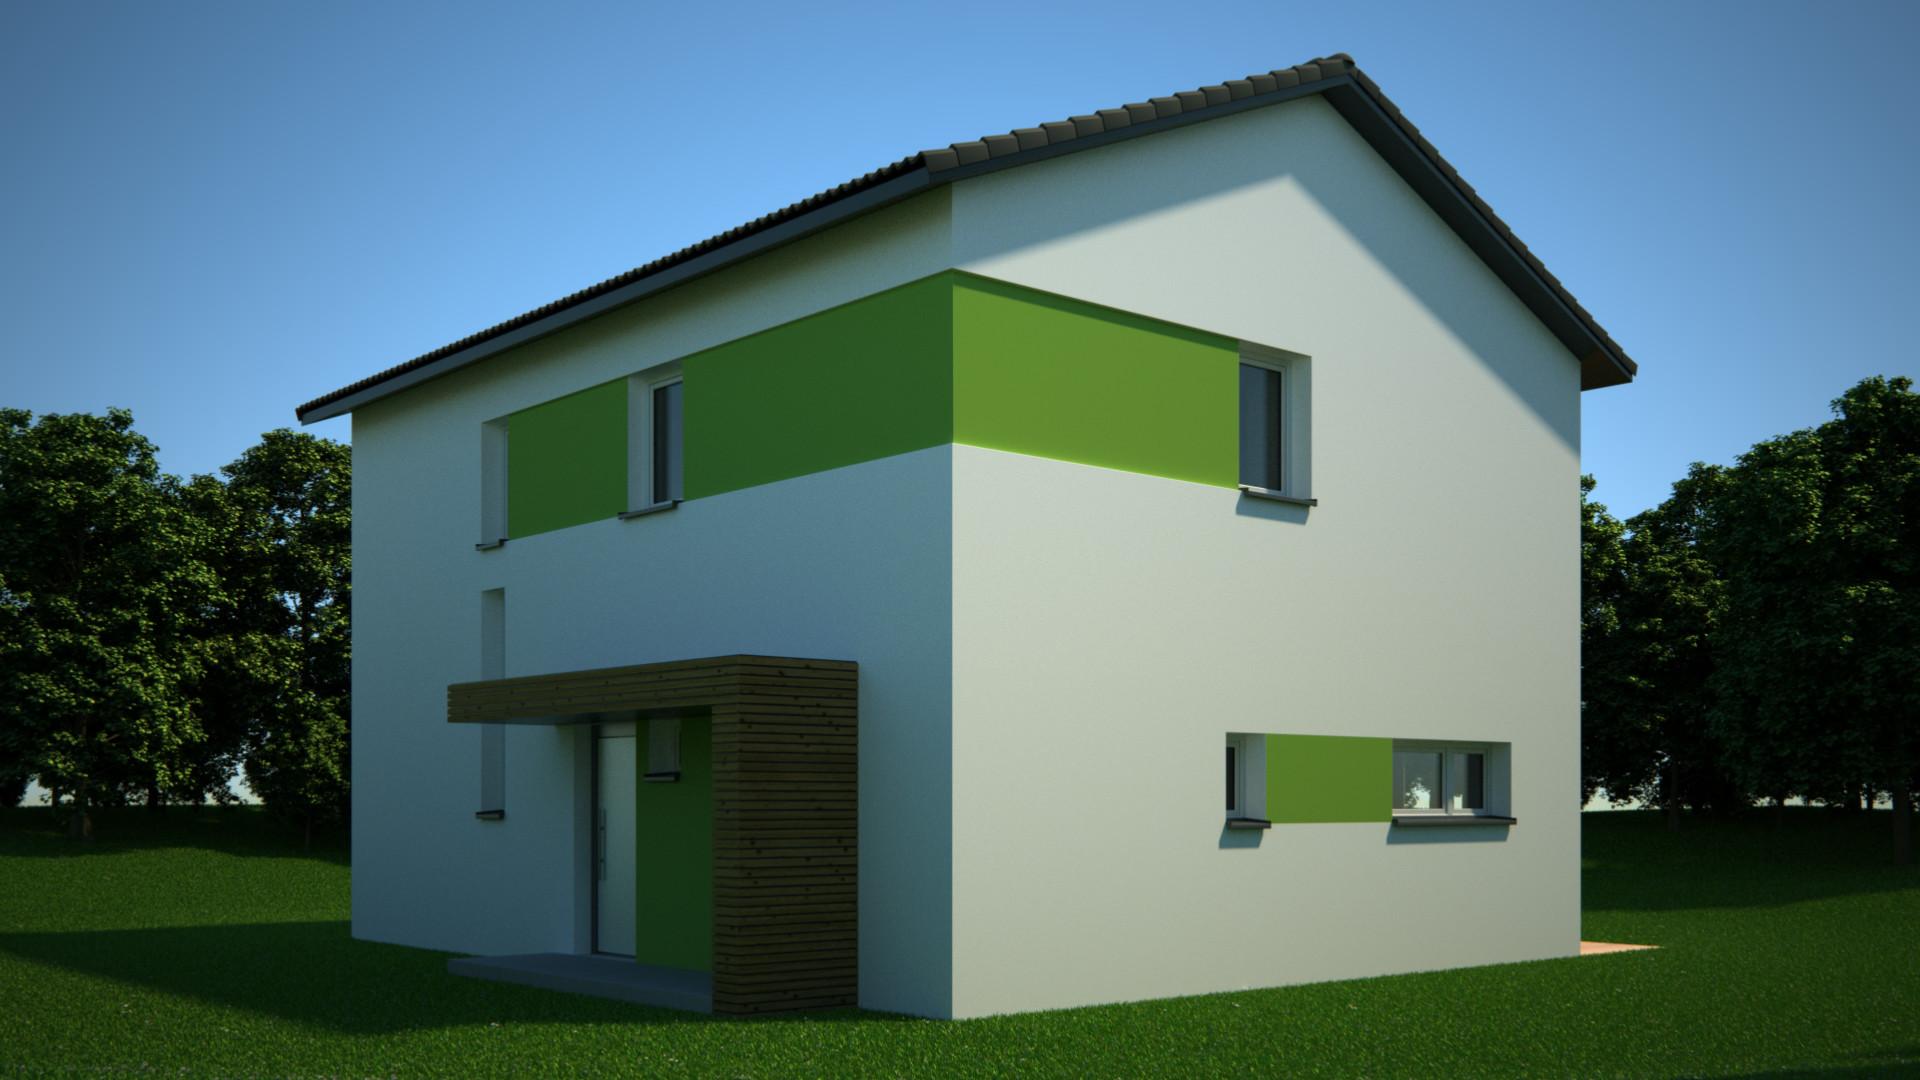 Reinhard kepplinger 130a cam1 terrasse dach iso 500 ohne vign refl trees stucco 94 newgrass tw